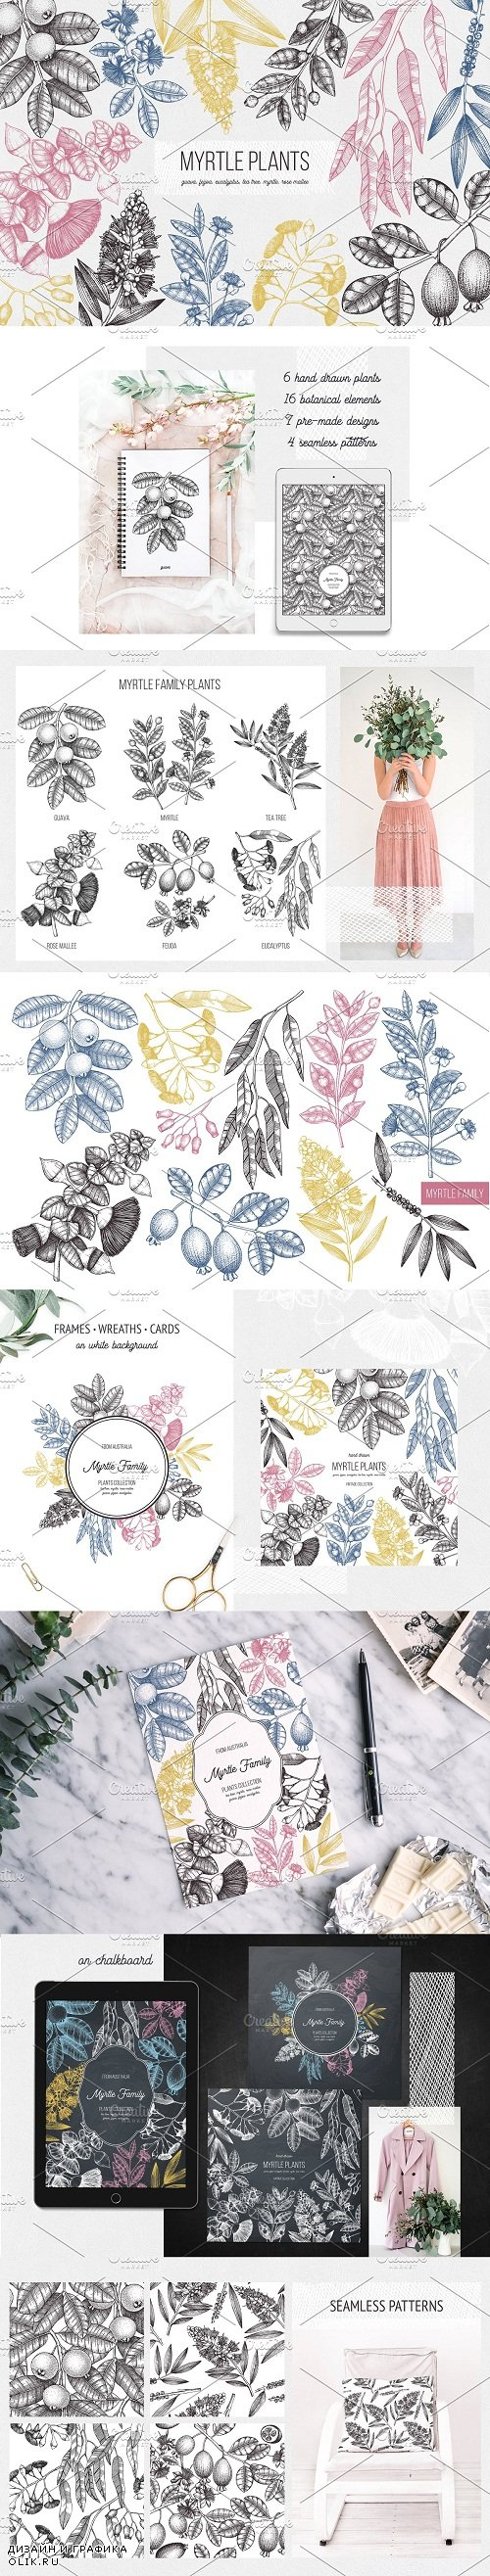 Myrtle Plants Collection - 2799313